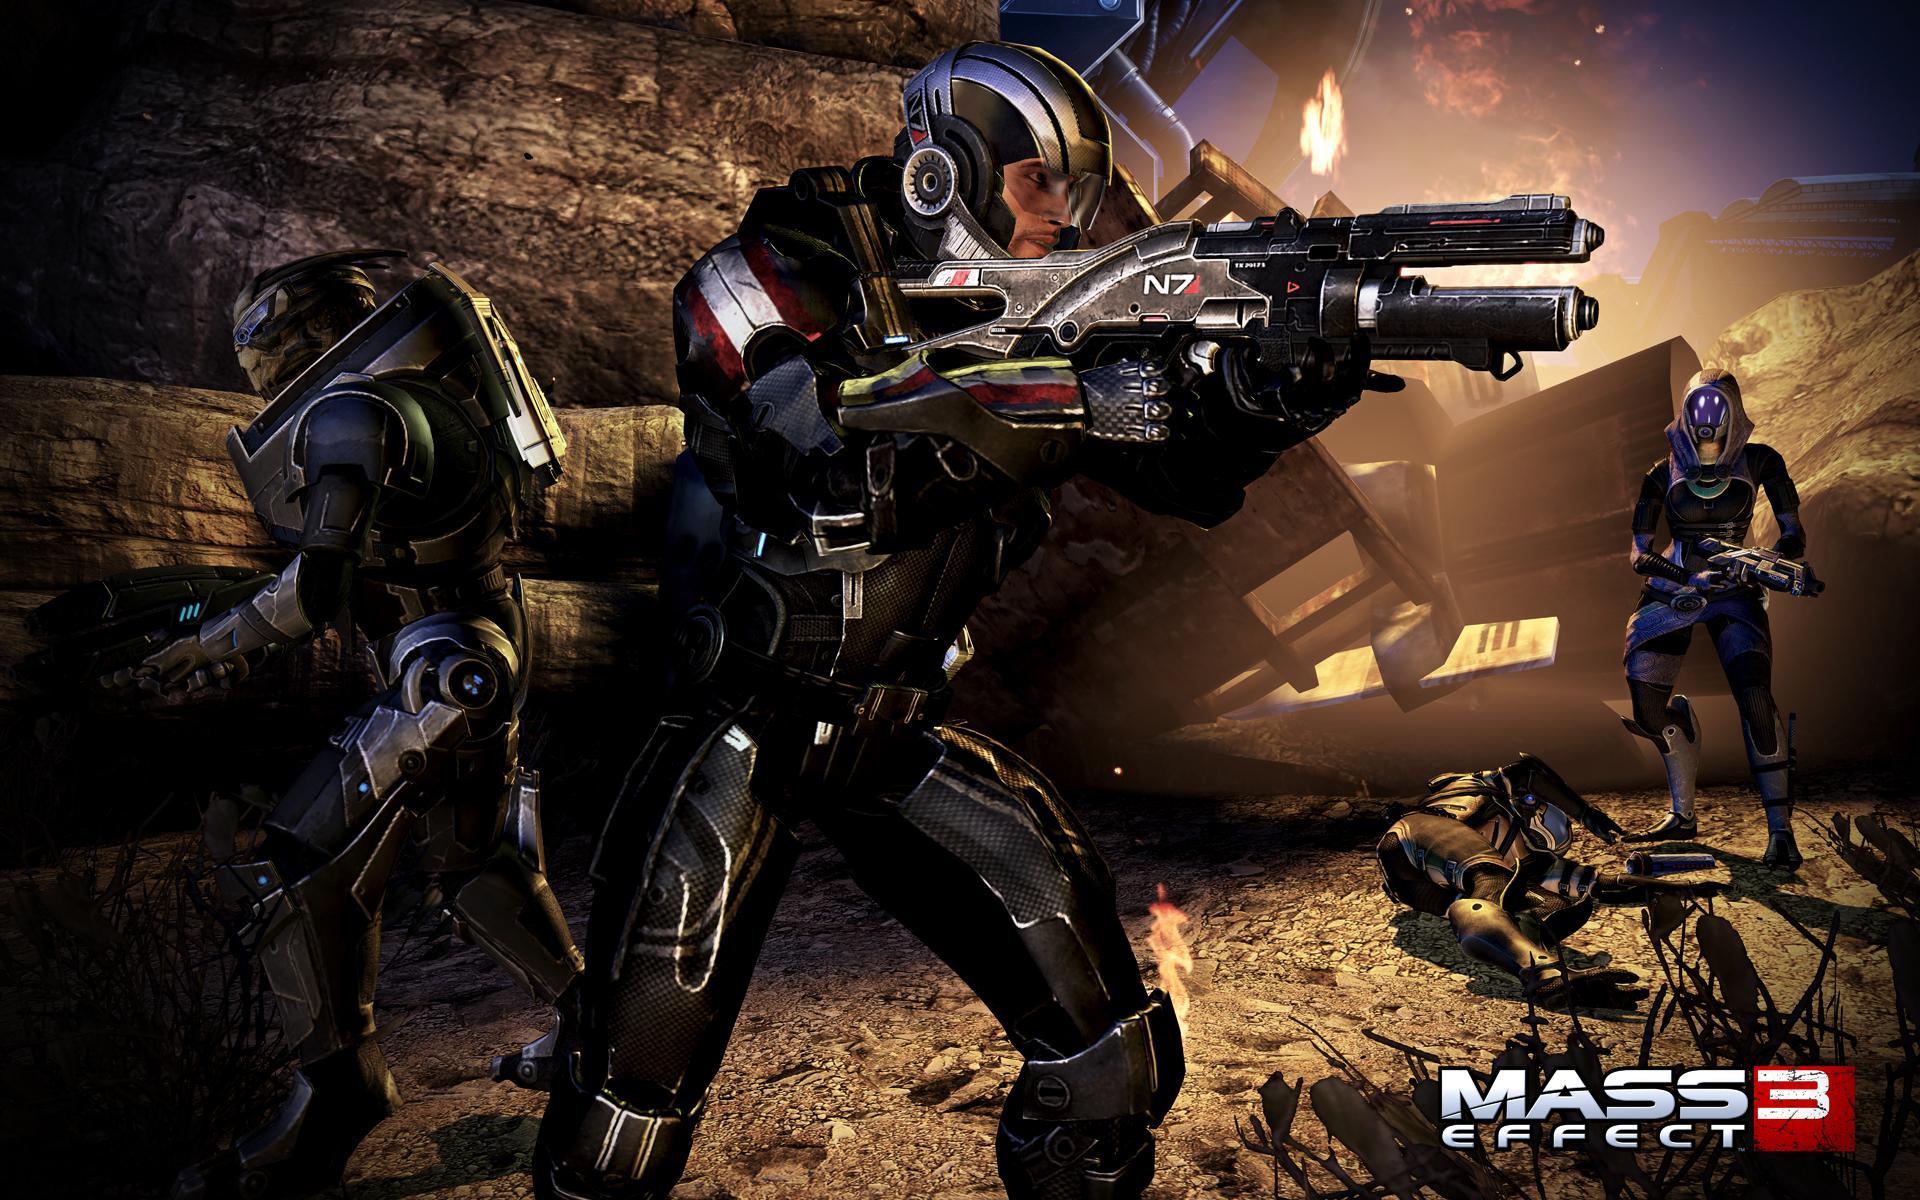 Mass Effect 3 weapons and armor guide | GamesRadar+